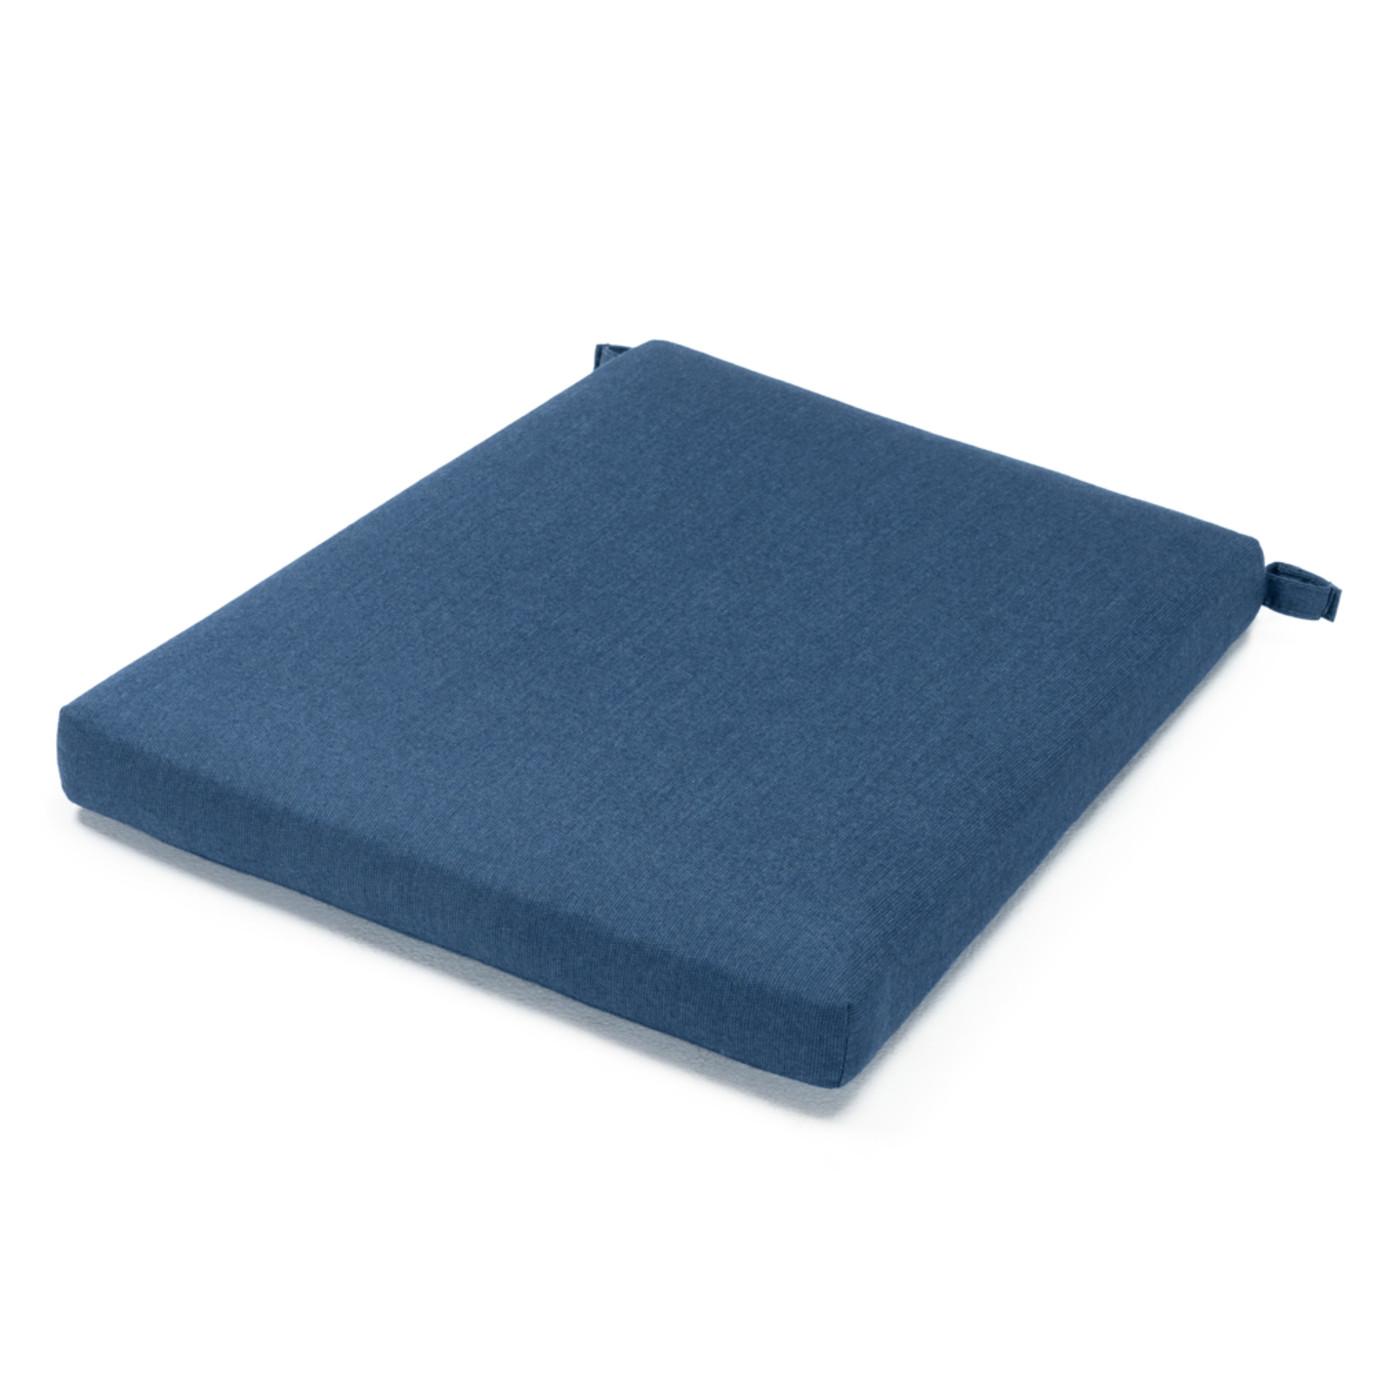 Portofino Comfort Dining Chair Cushion - Laguna Blue